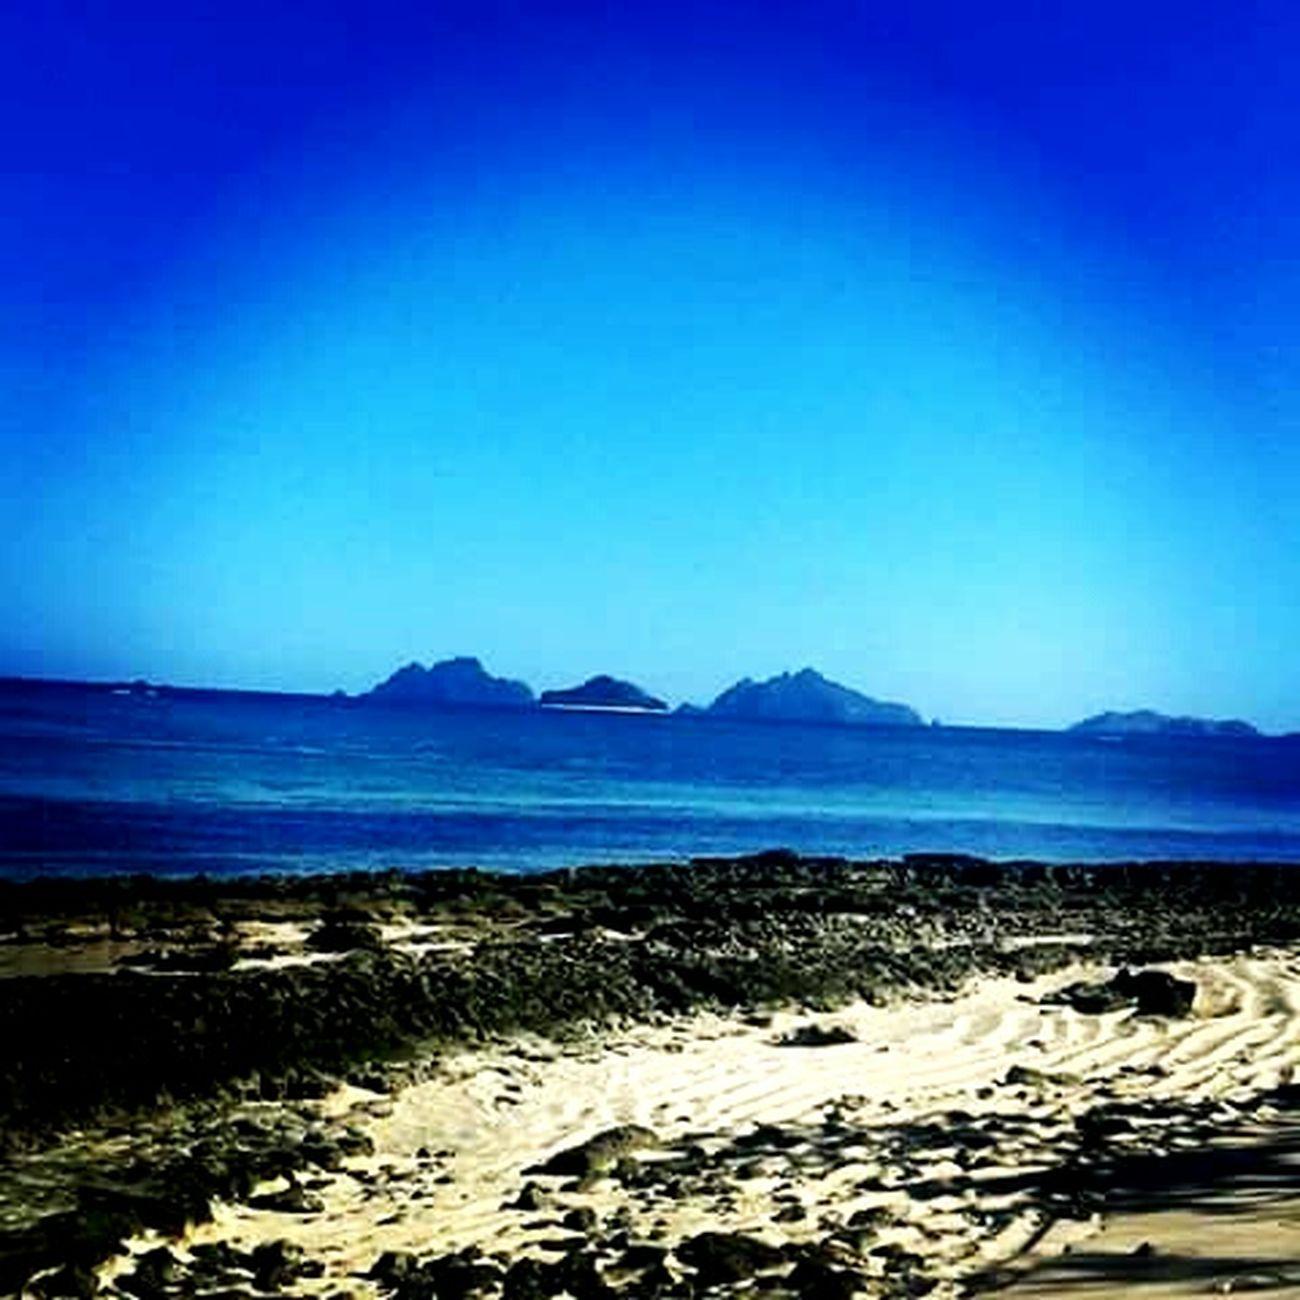 The KIOMI Collection Matamanoa Island Resort Blueskies Beautiful View Beautiful Nature Whitesands Rocky Beach That ManaIslandResort Sunsetbeach Taking Photos Home Eyemfiji EyeEm Nature Lover Eyembestedit